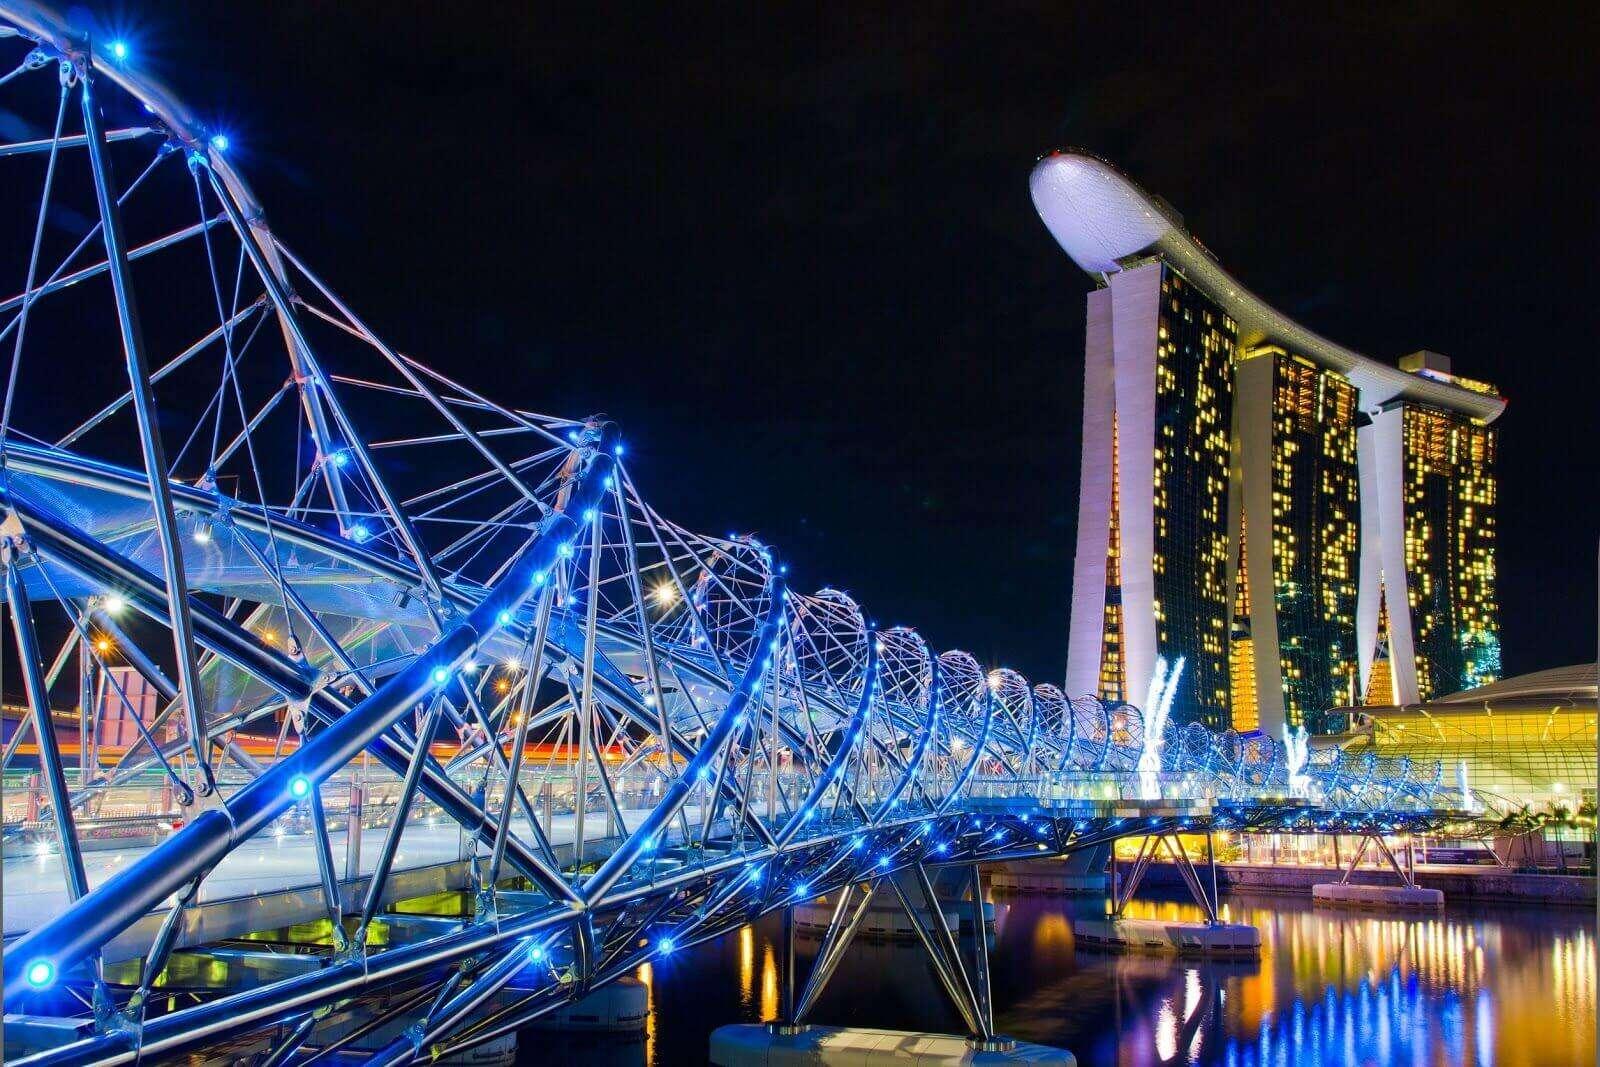 helix-bridge_24th oct